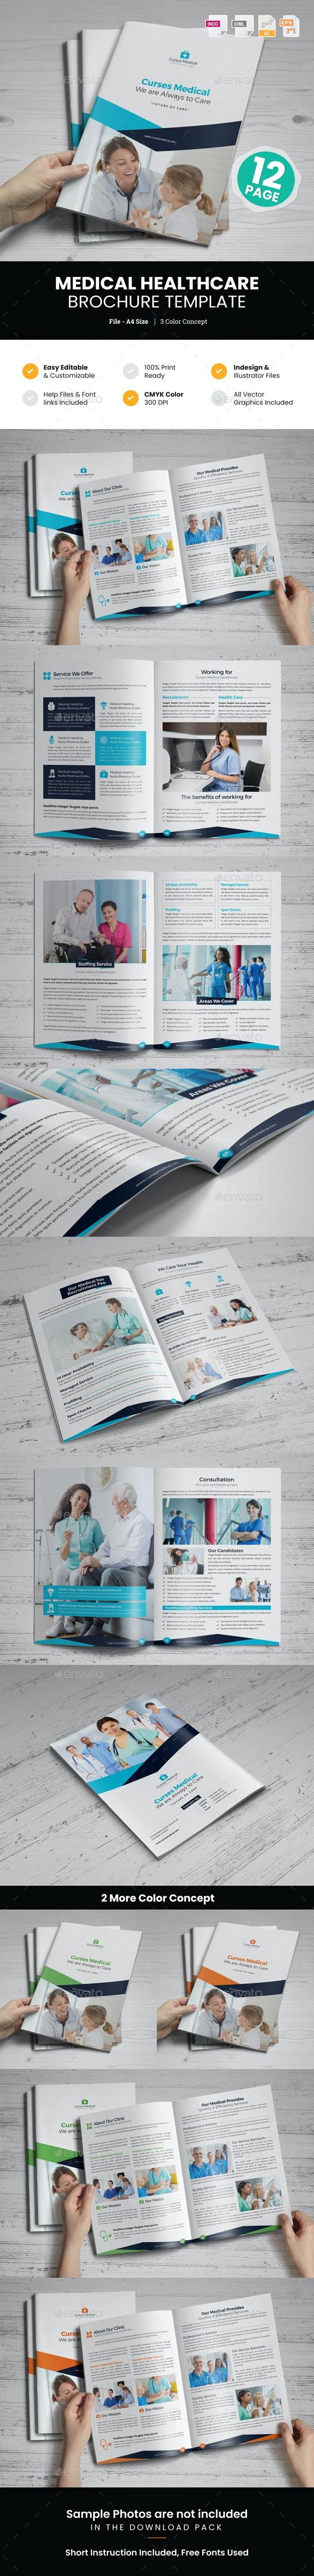 Medical HealthCare Brochure v1 - Corporate Brochures